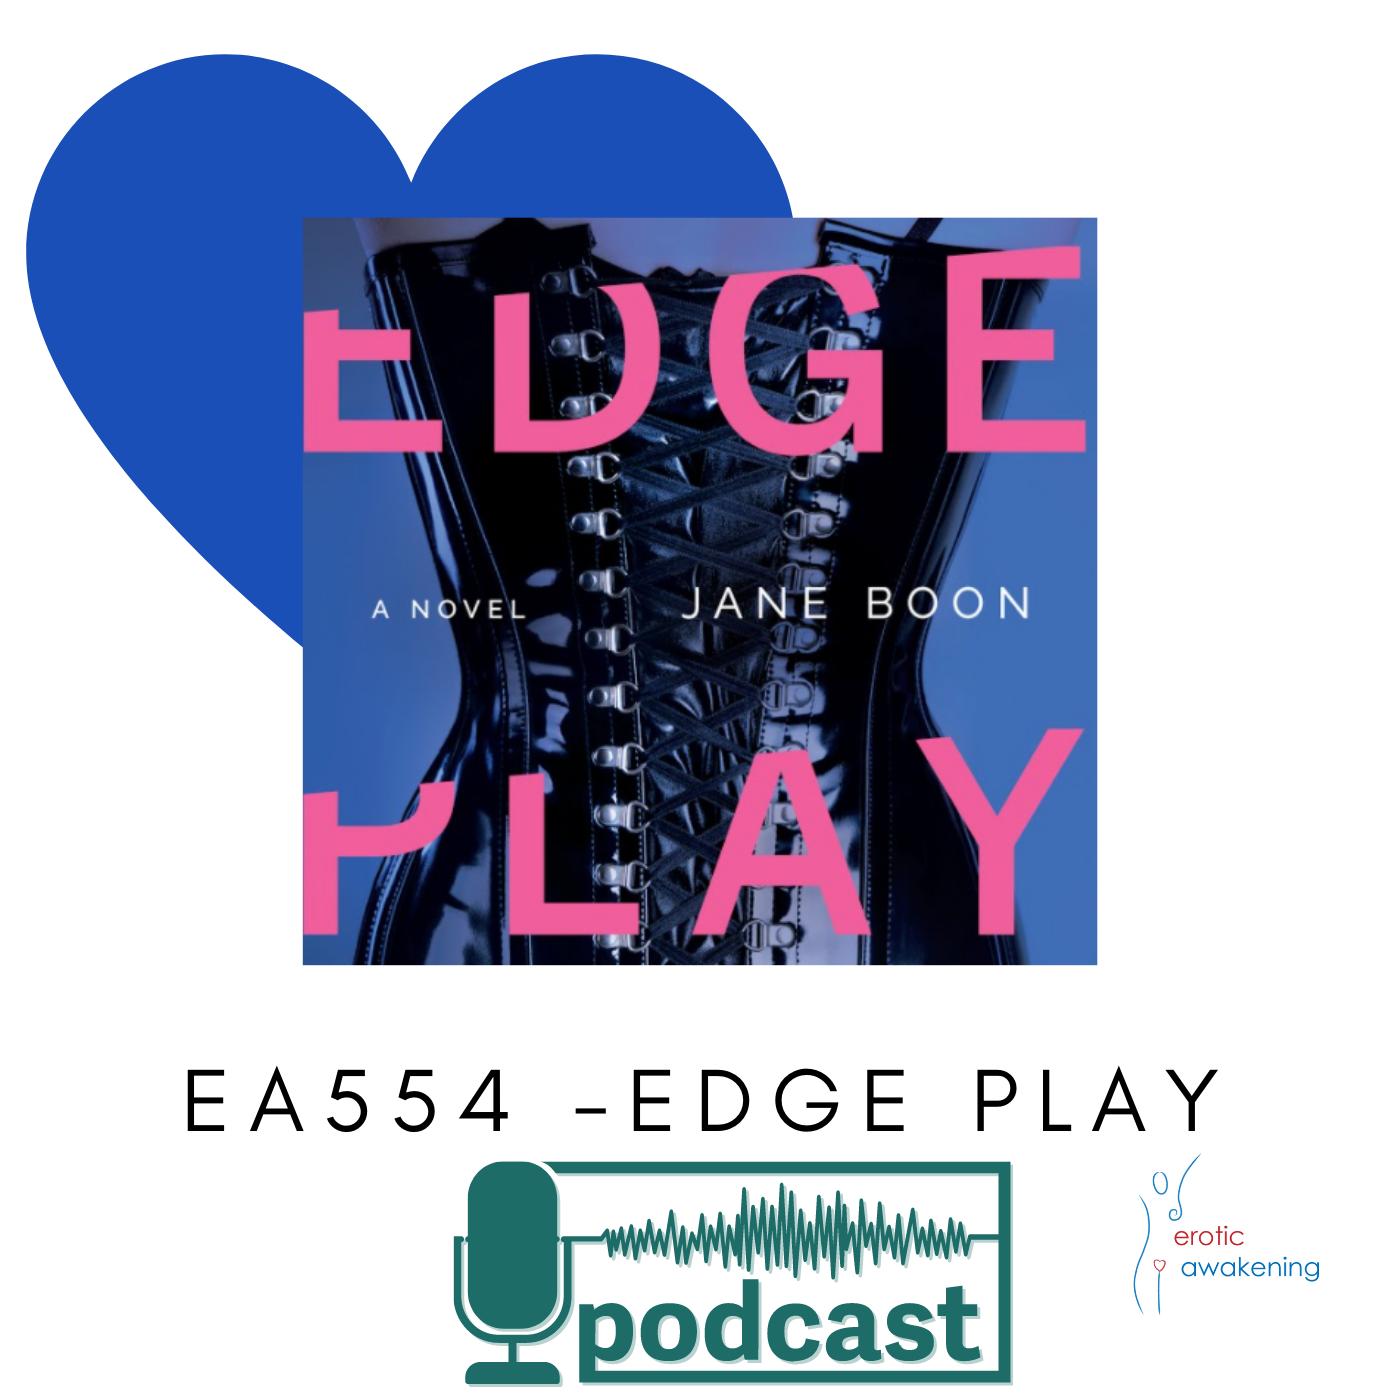 Erotic Awakening Podcast - EA554 - Edge Play